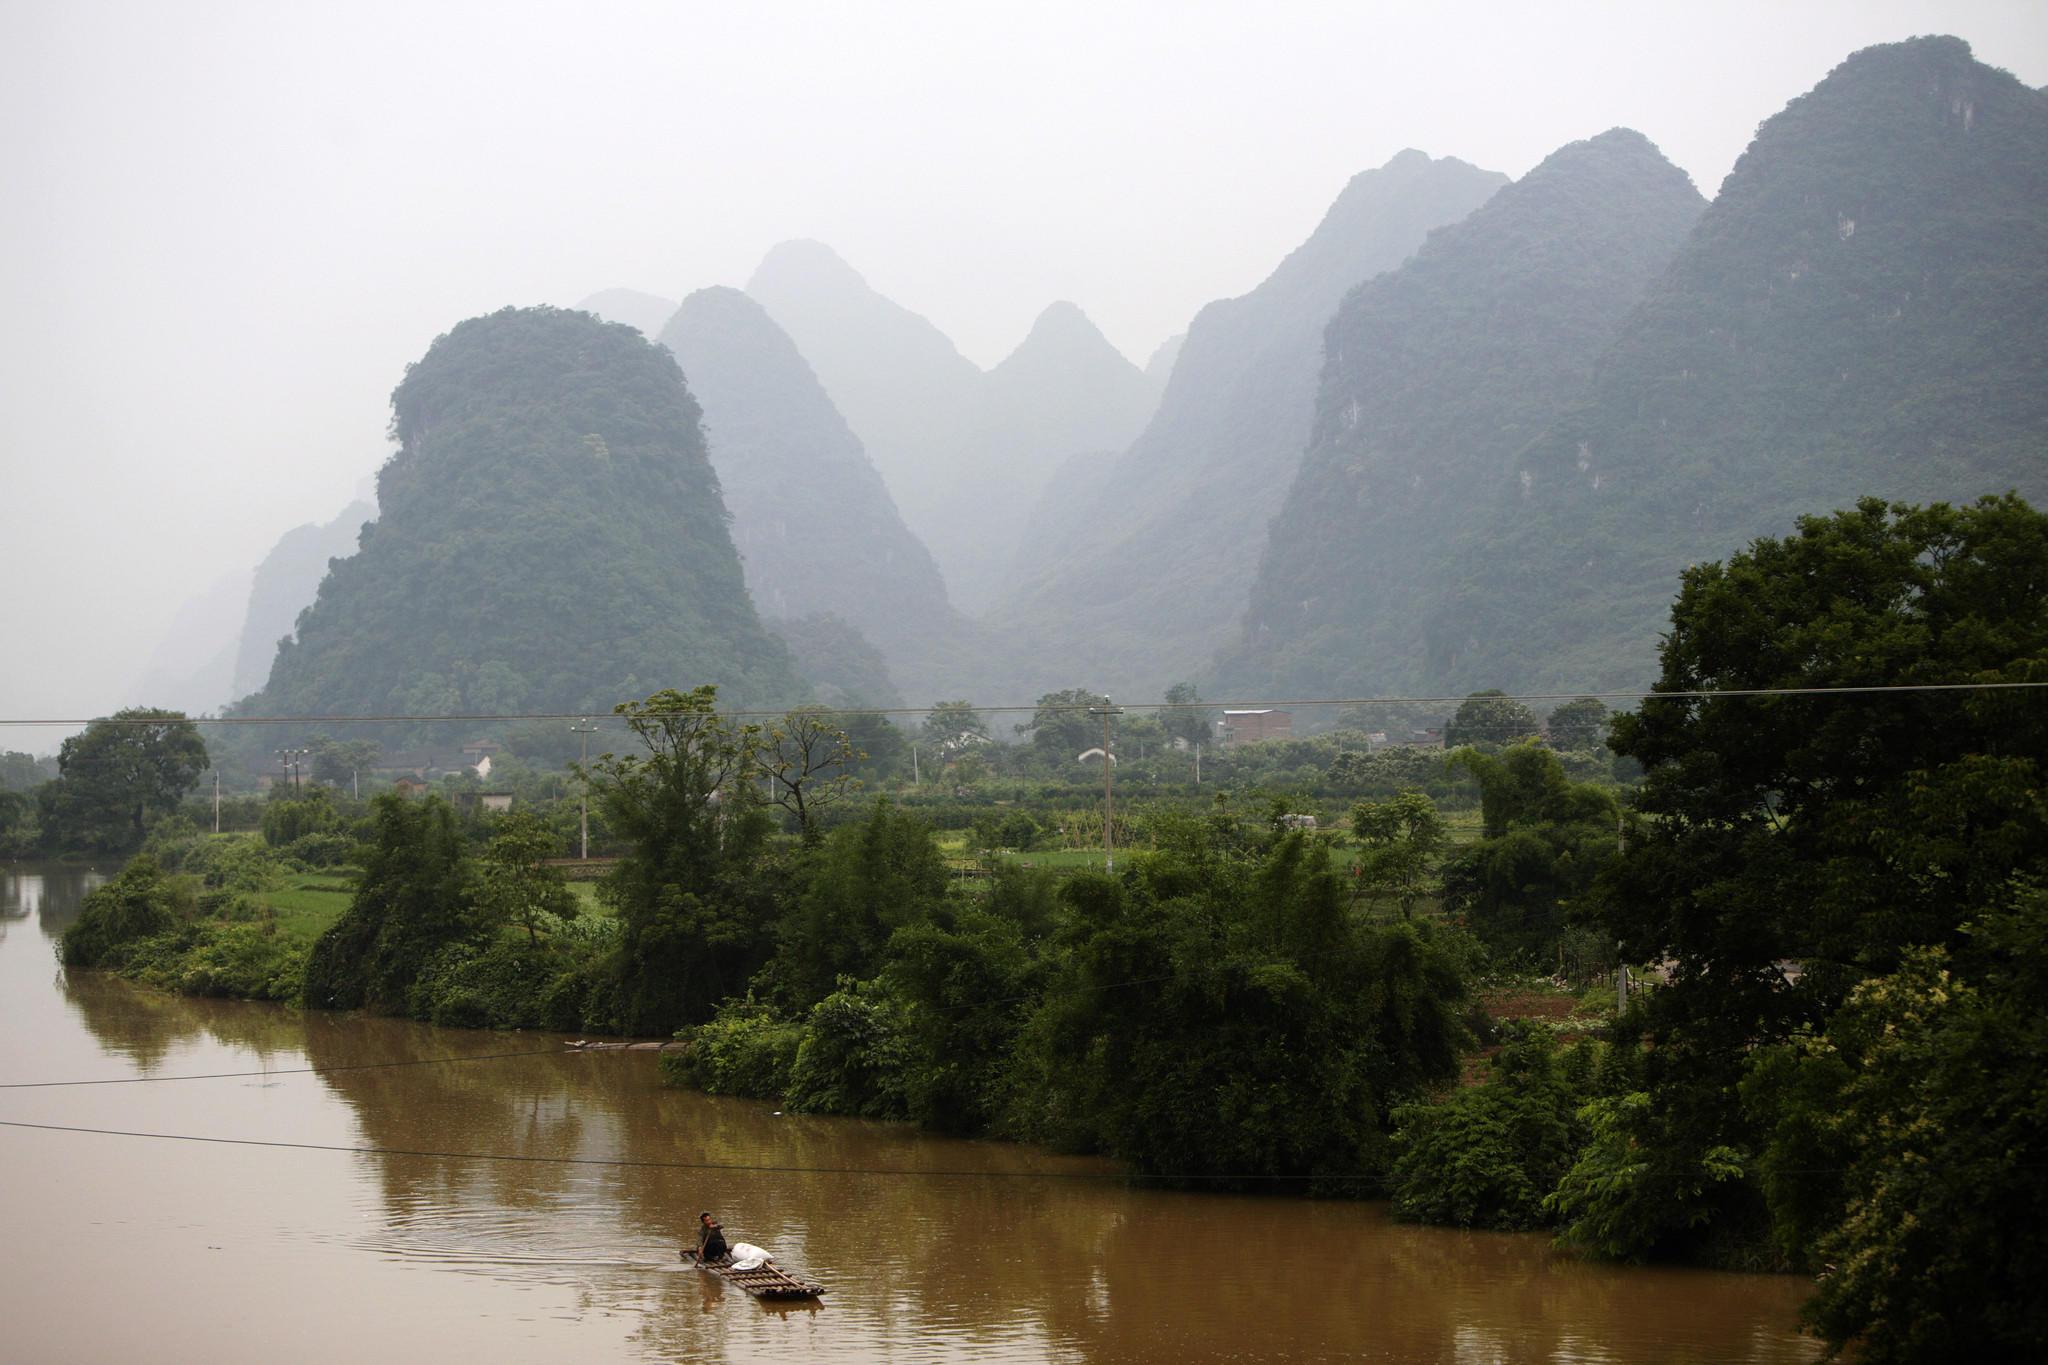 A man paddles on the Li River on the outskirts of Yangshuo, southwest China's Guangxi Zhuang Autonomous Region May 25, 2007.